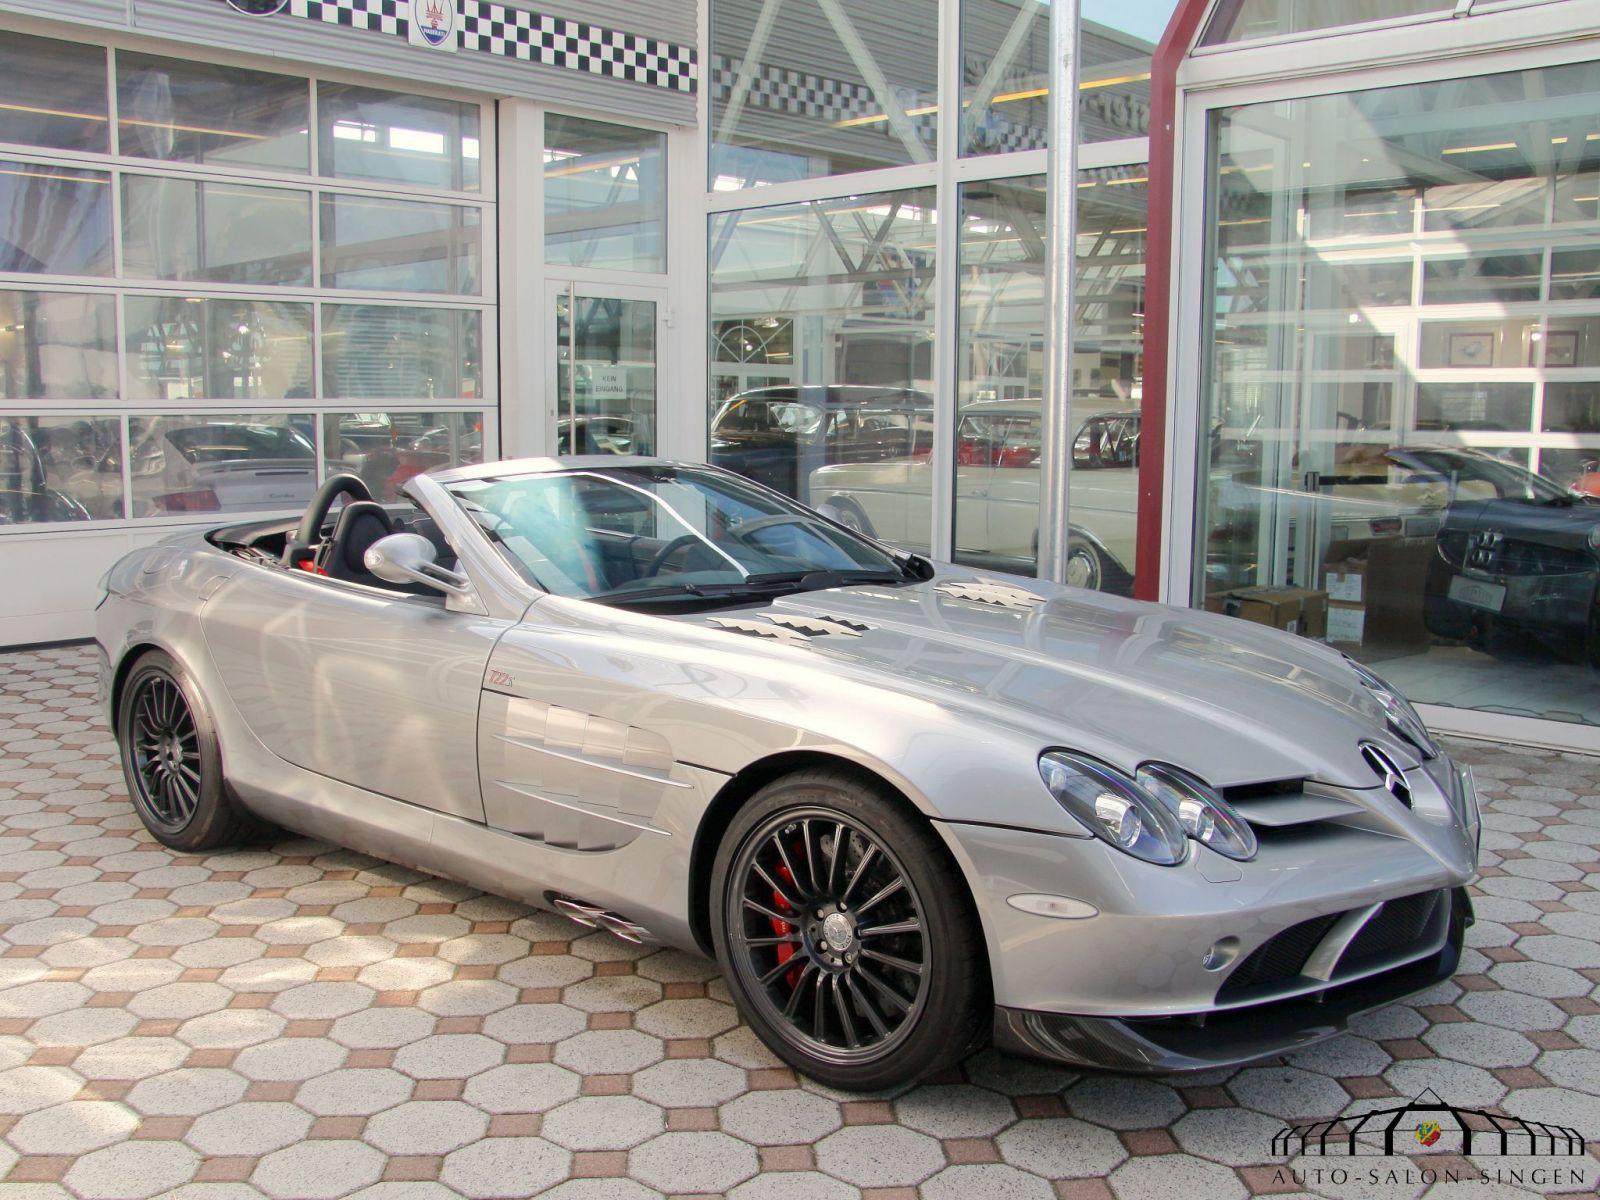 Mercedes benz slr mclaren roadster 722 s roadster auto for Mercedes benz slr